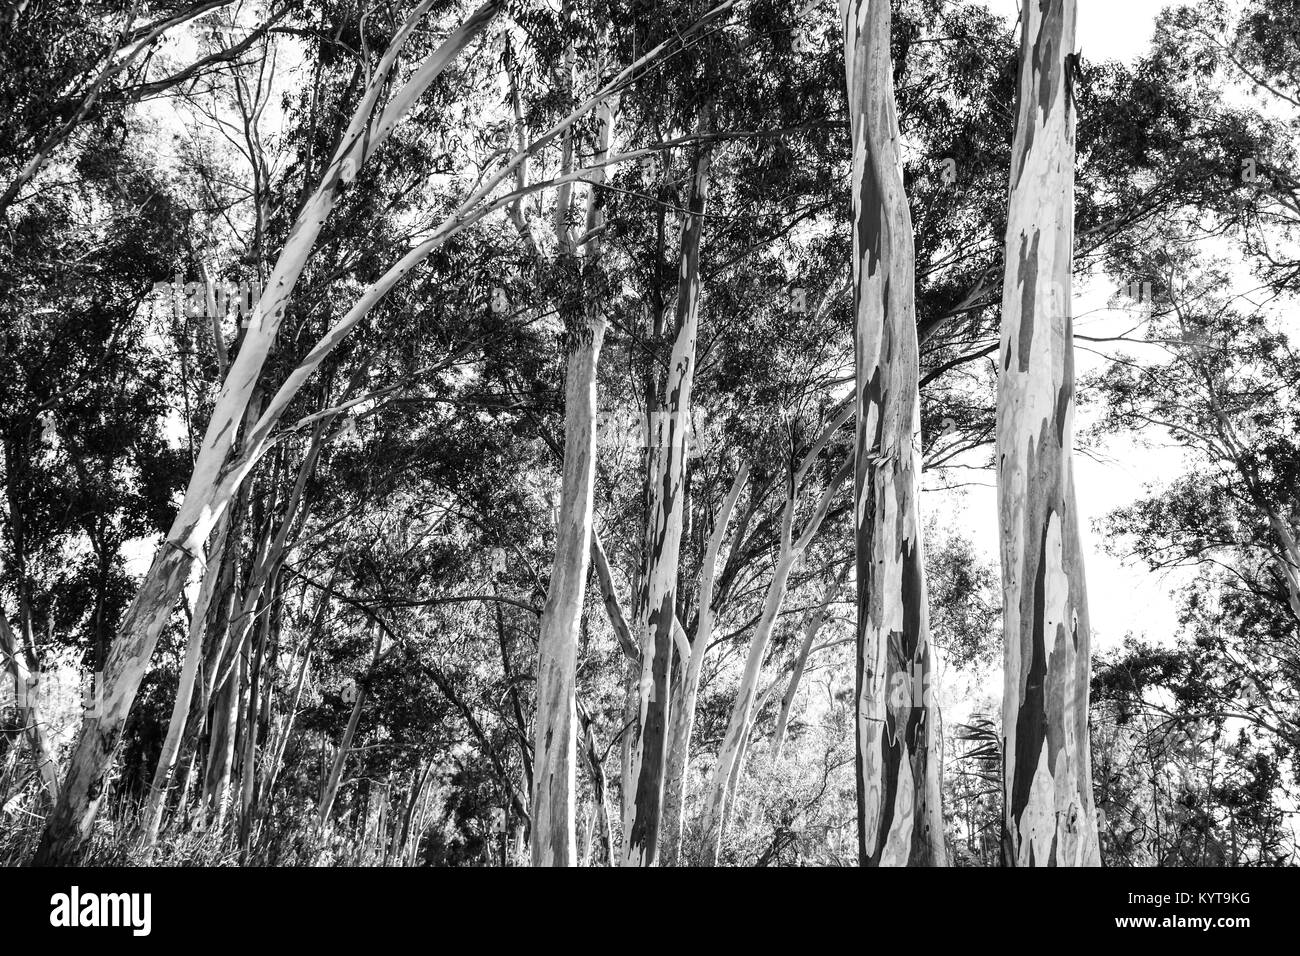 Eucalyptus Globulus Tree - Stock Image